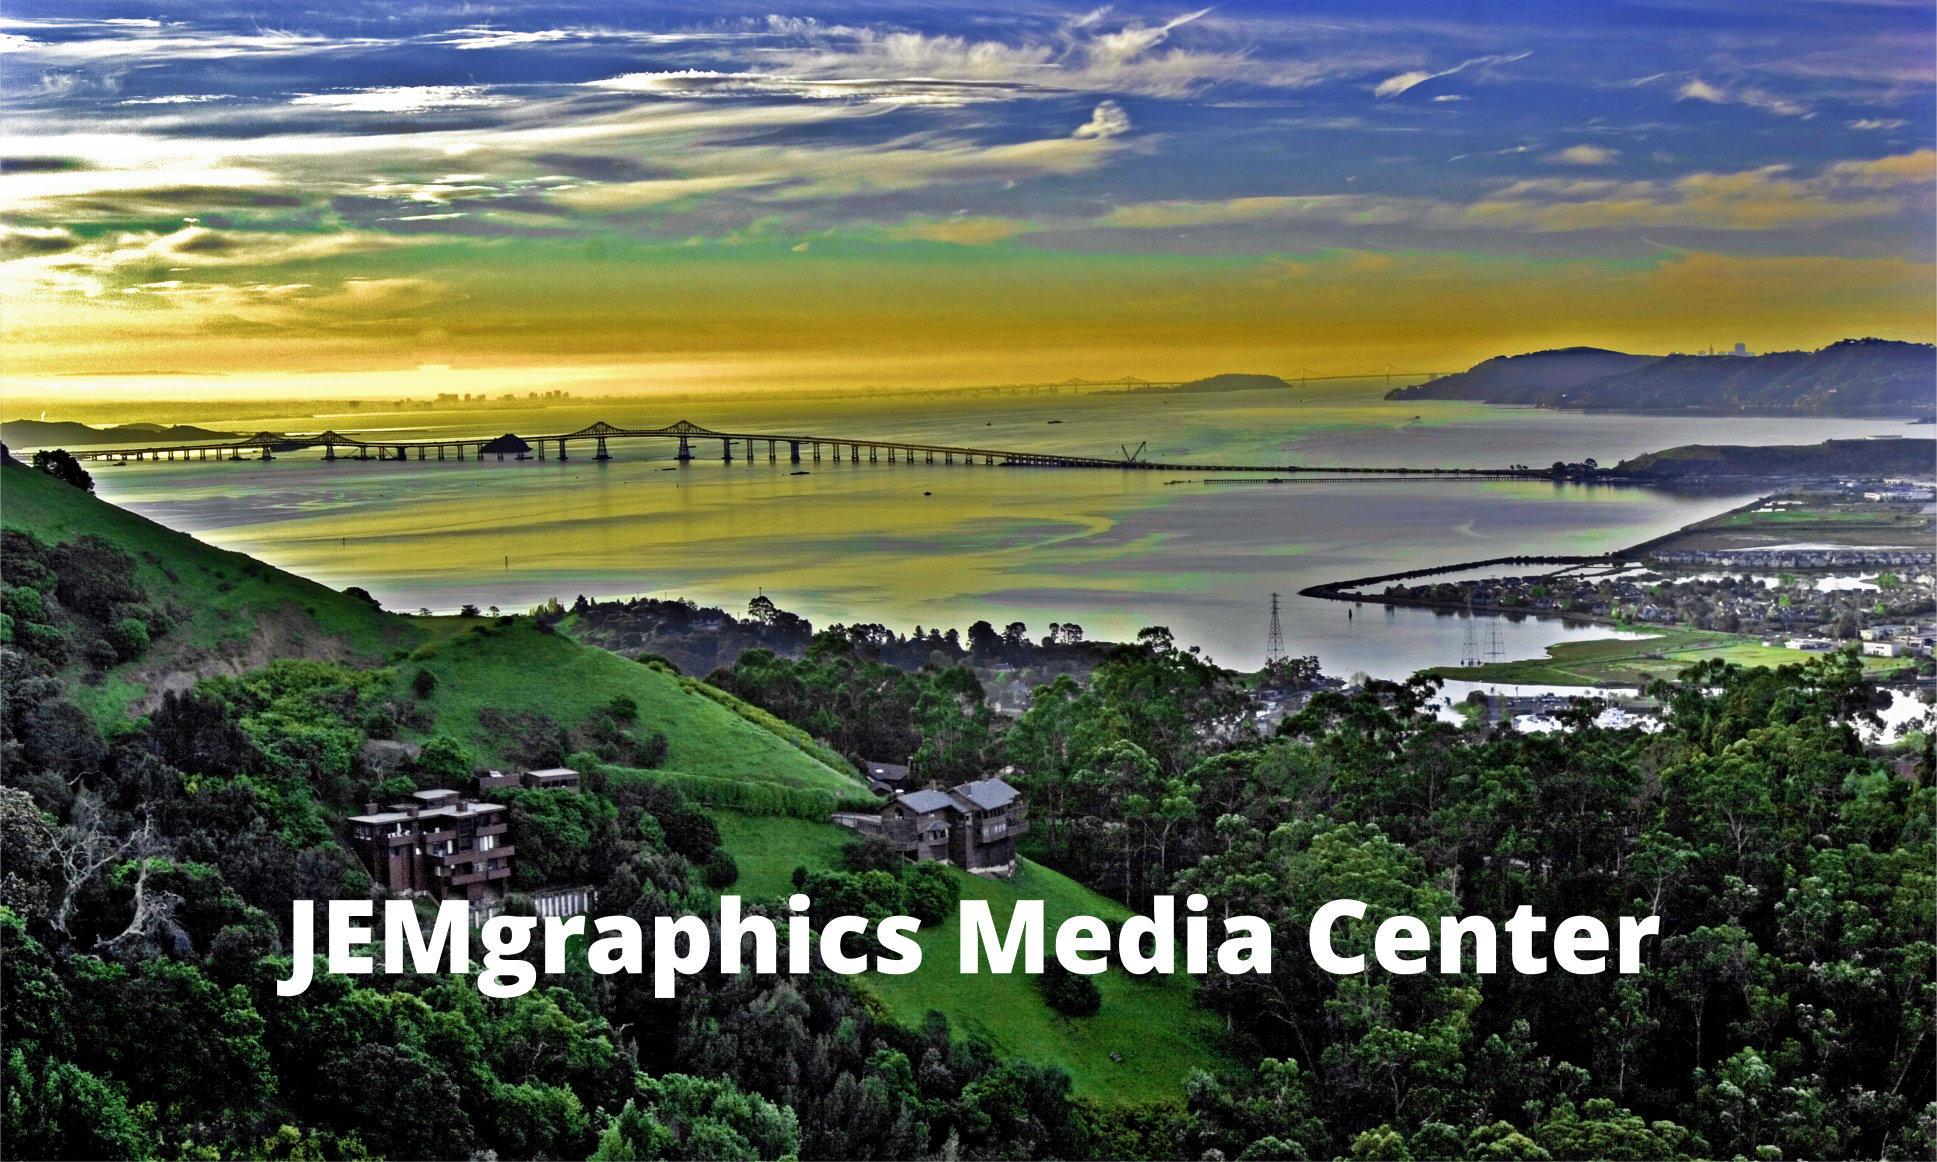 JEMgraphics Media Center image 15